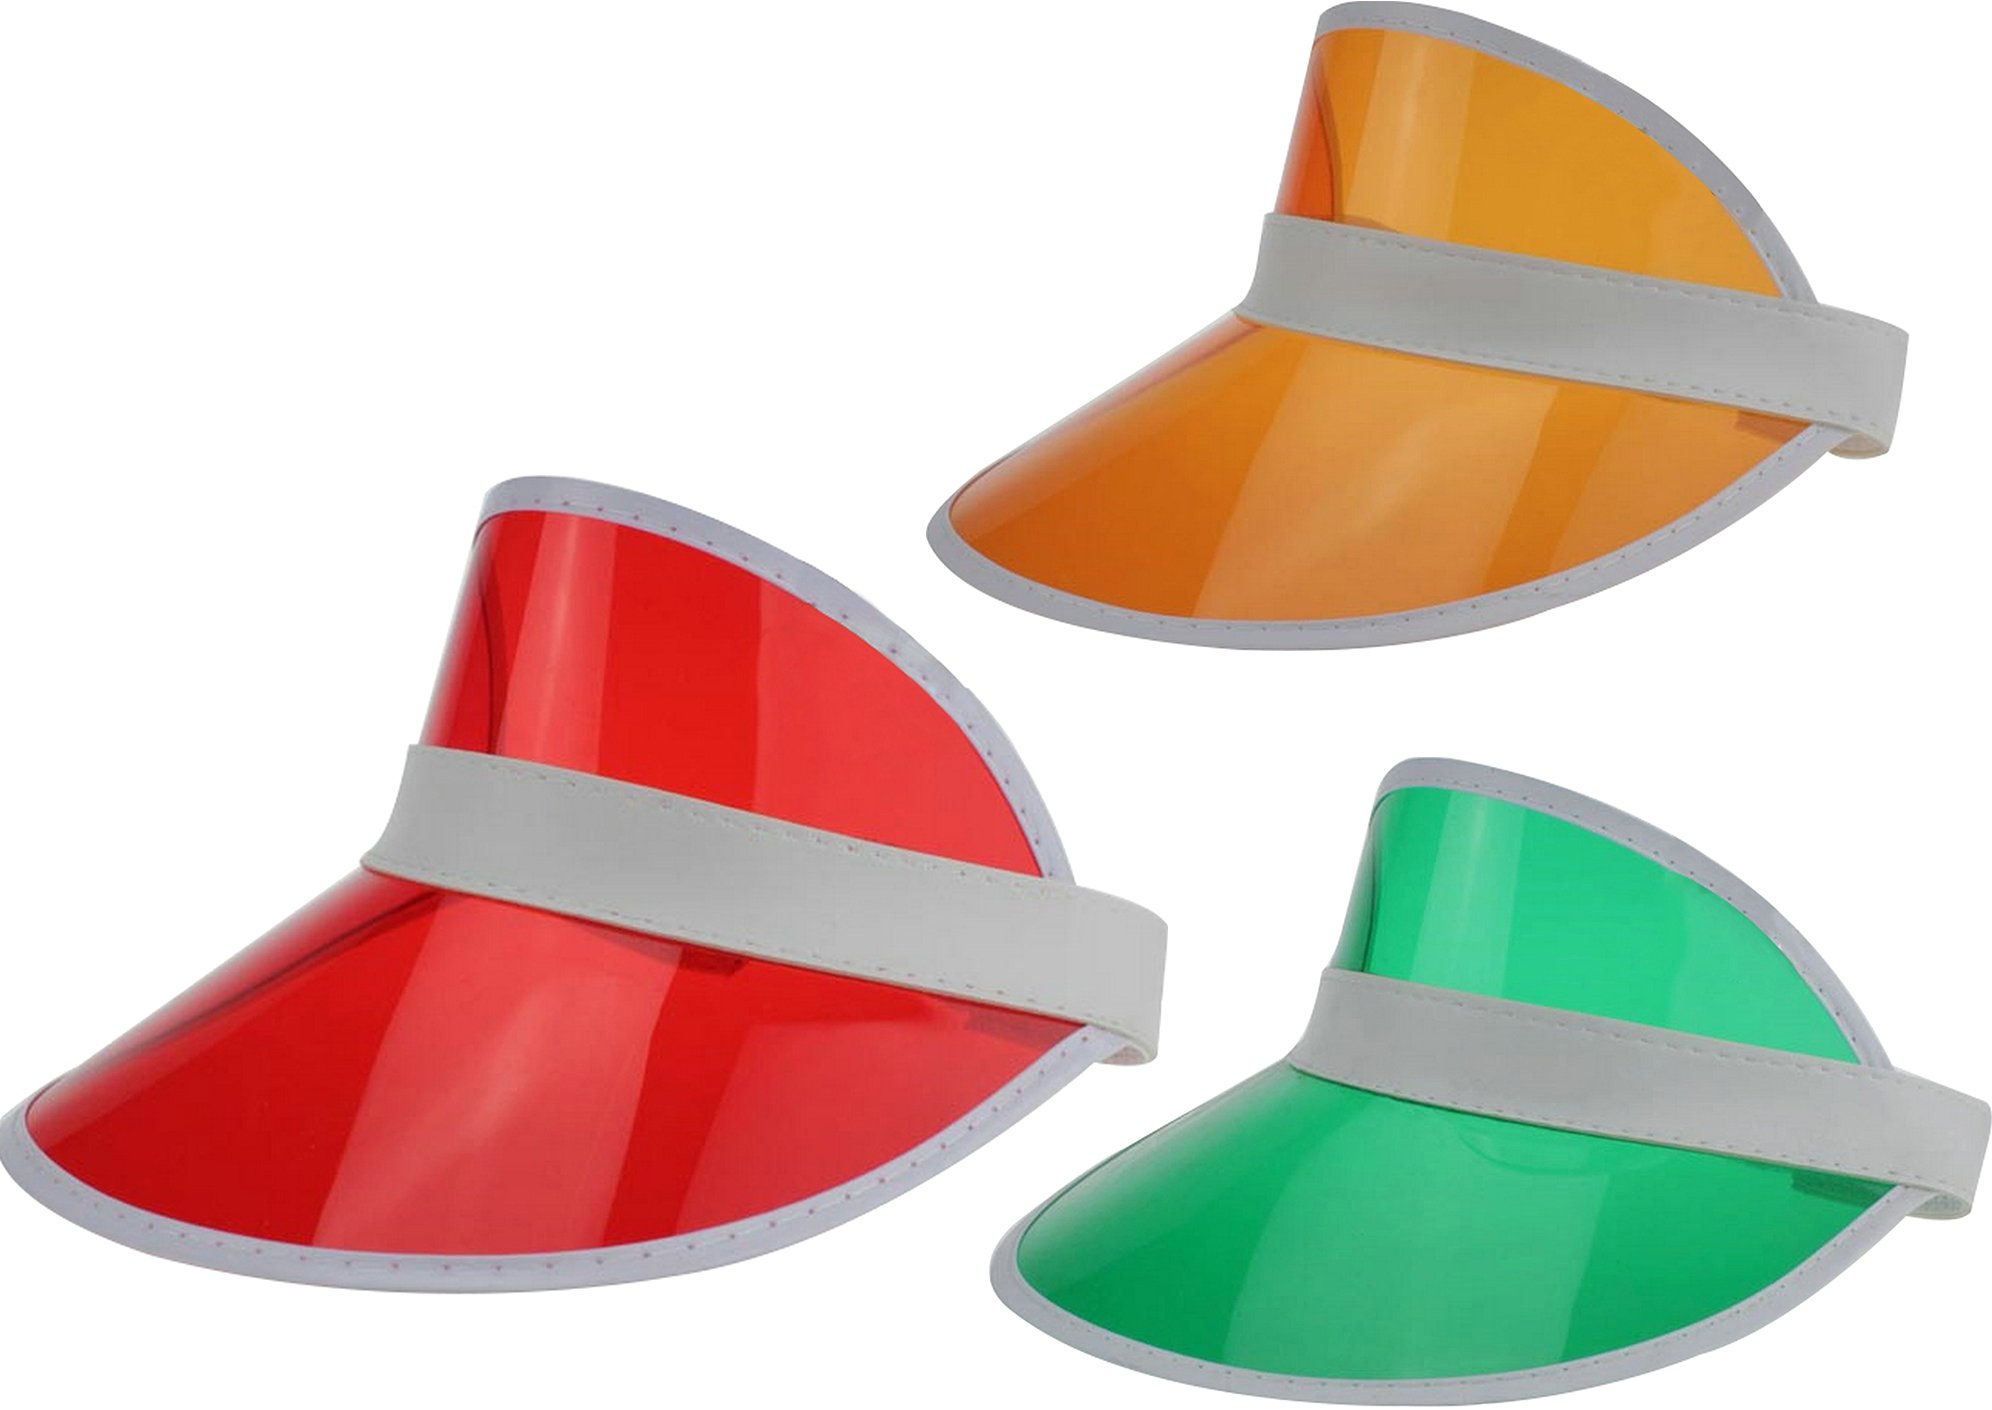 Ababalaya Unisex SPF 50+ UV Protection PVC Wide Brim Transparent Sun Visor Hat (Red+Orange+Green)